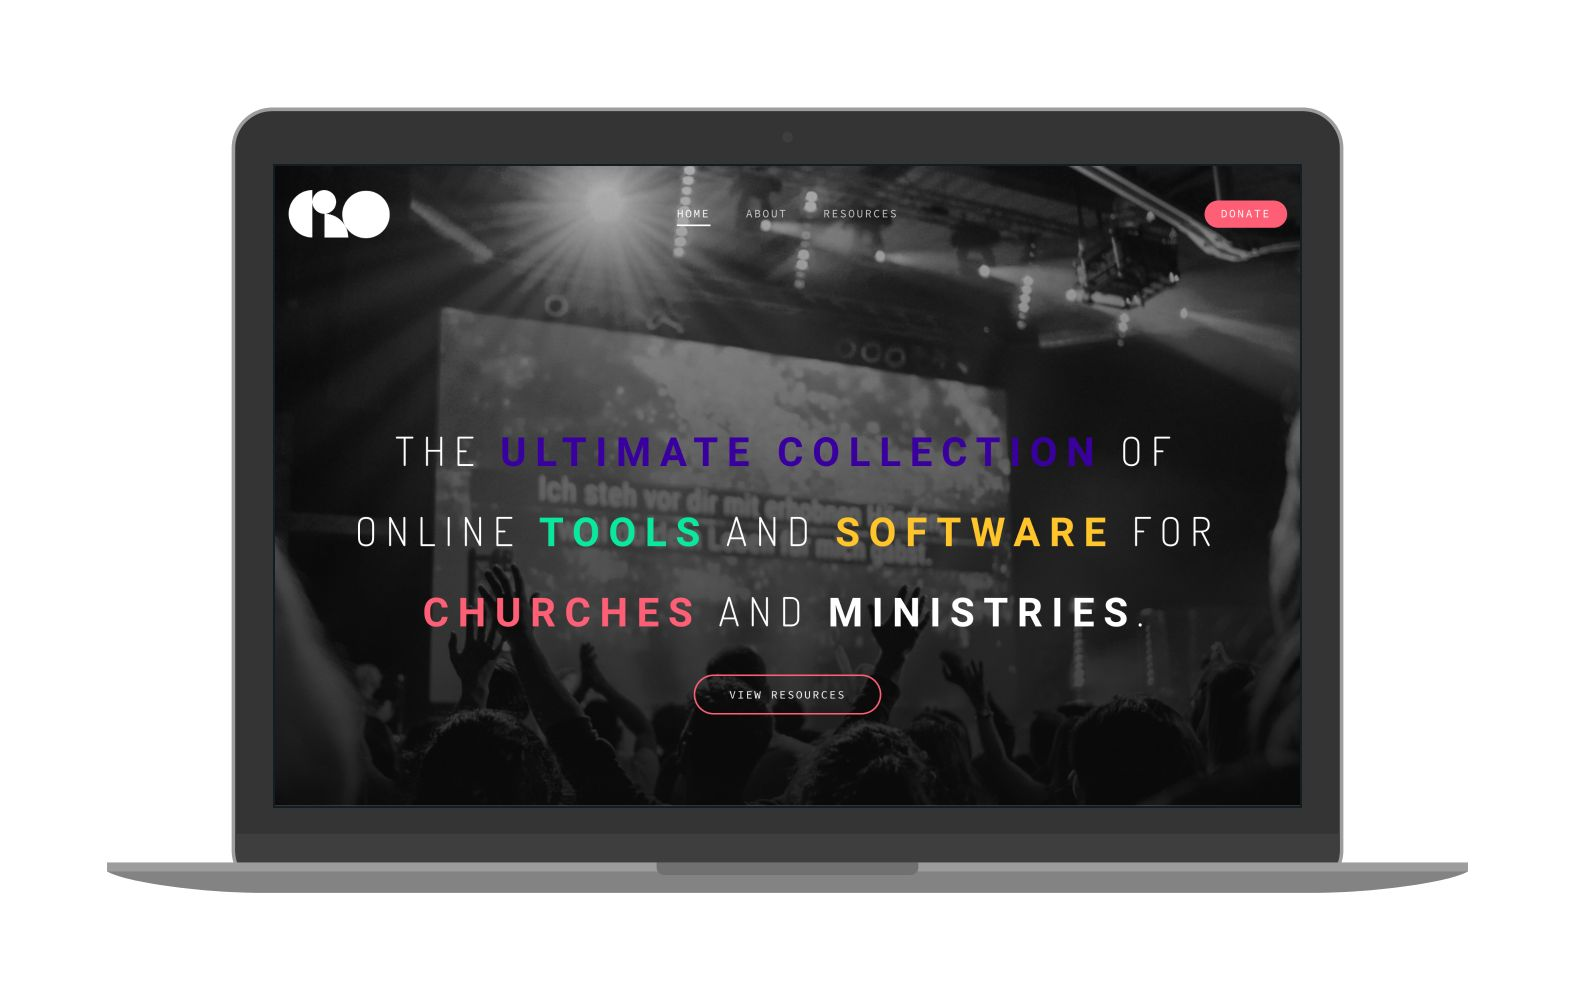 Swank Design Website and Graphic Design Church Resources Online Mockup